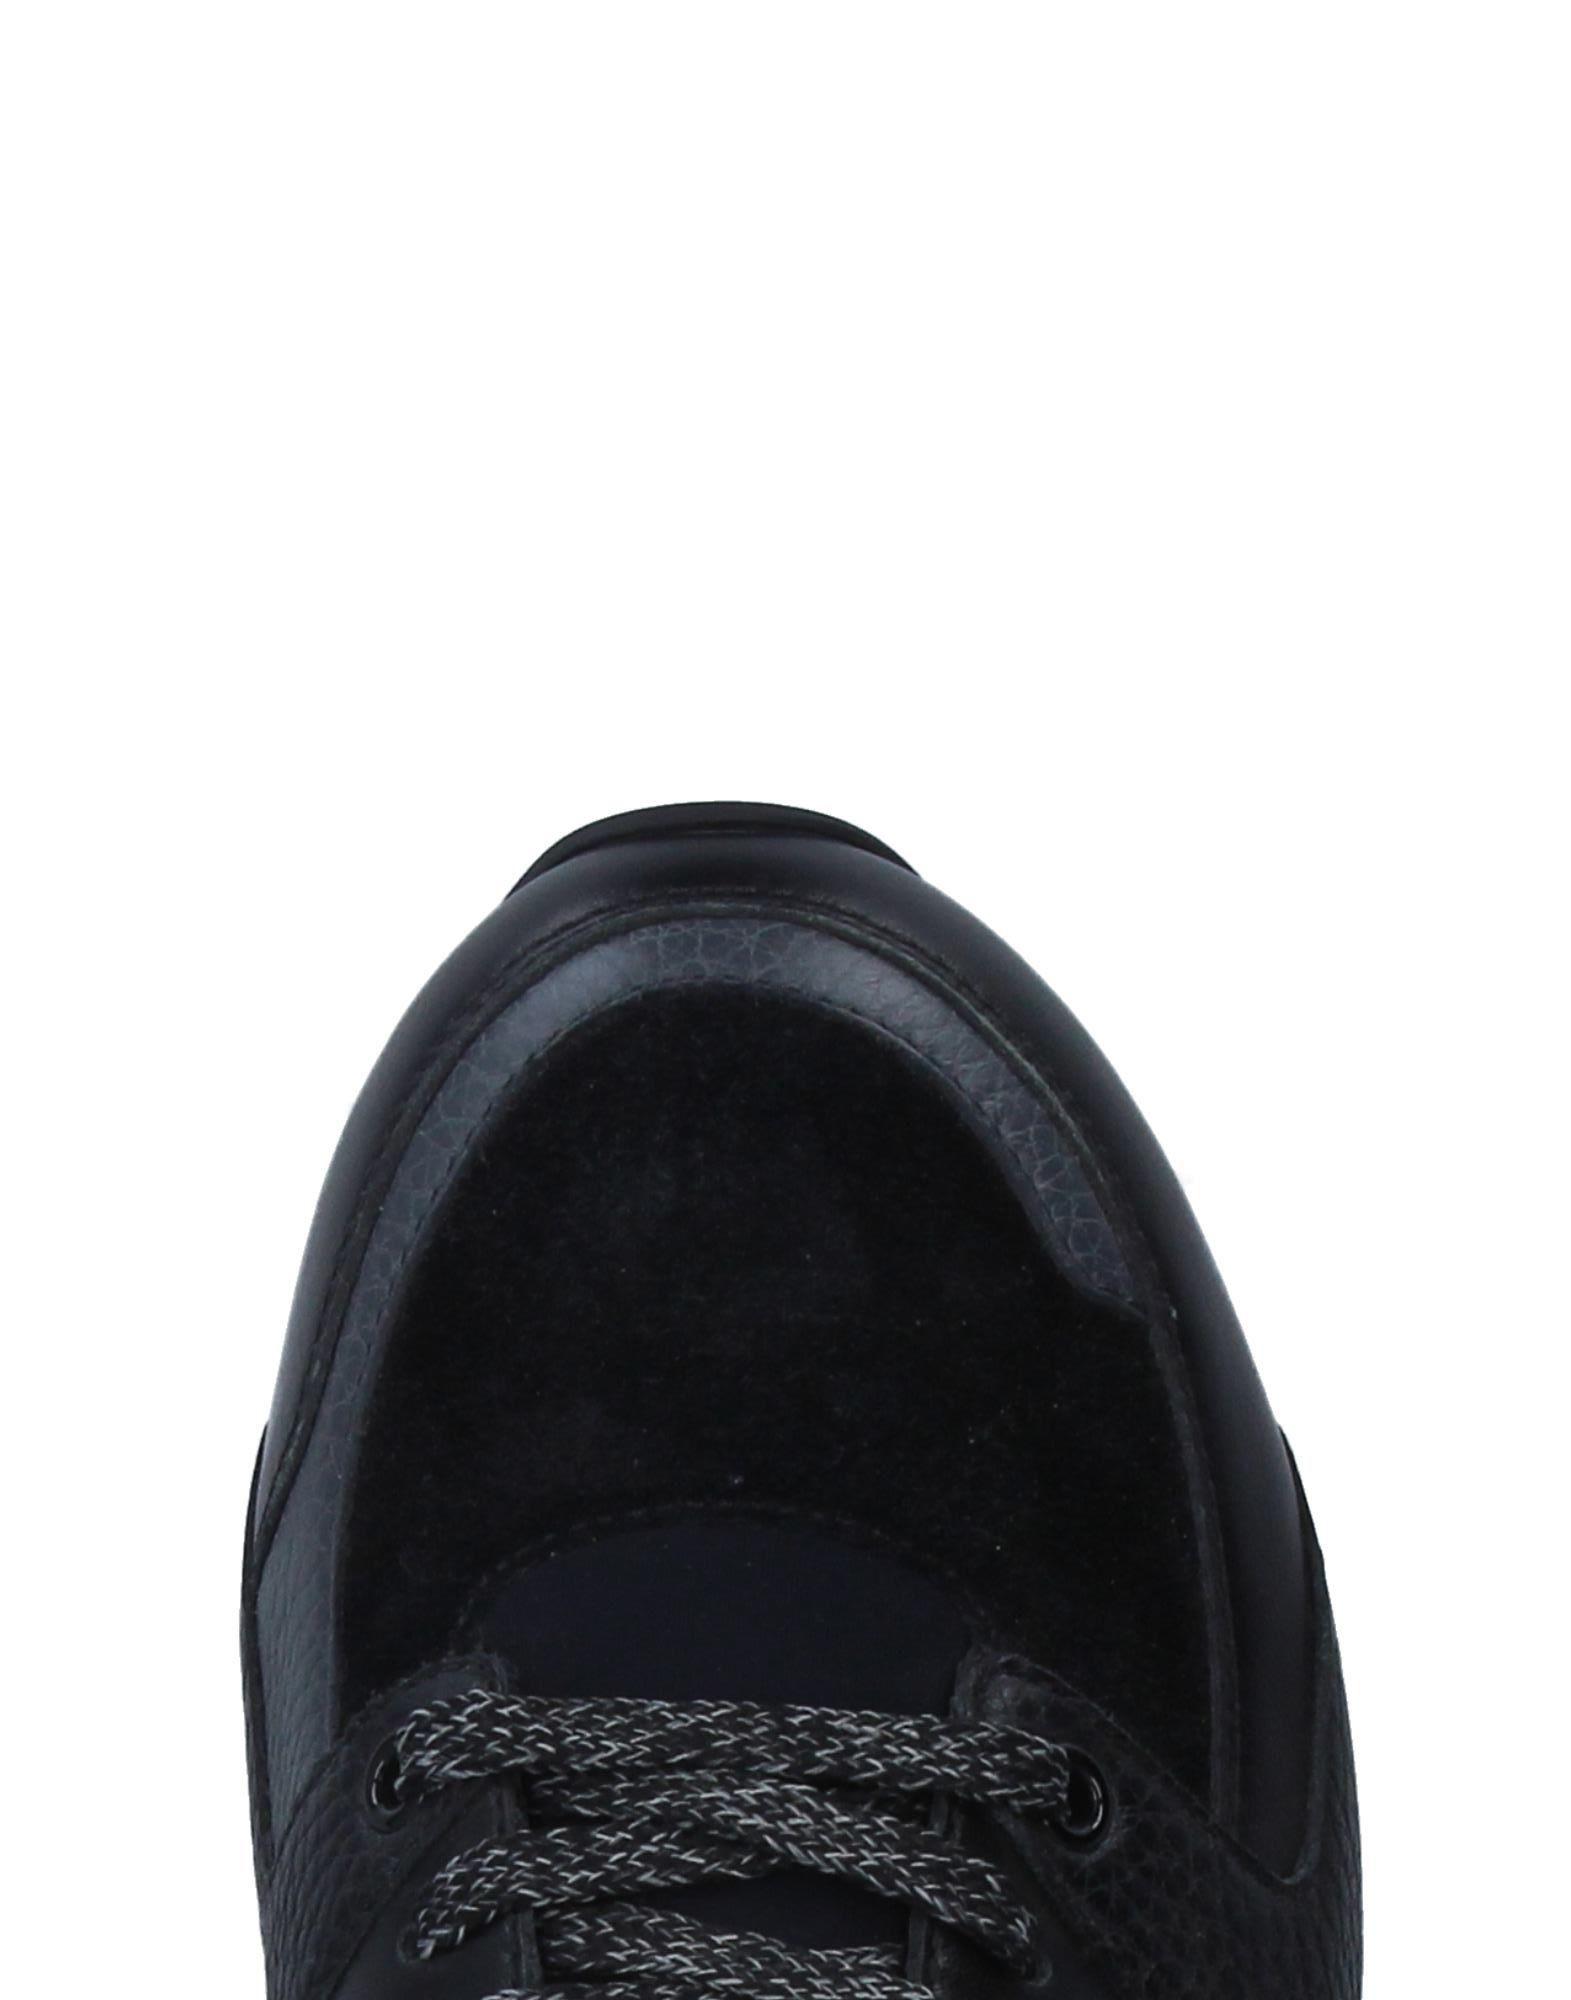 Dolce & Gabbana Sneakers Herren  11315152SE Gute Qualität beliebte Schuhe